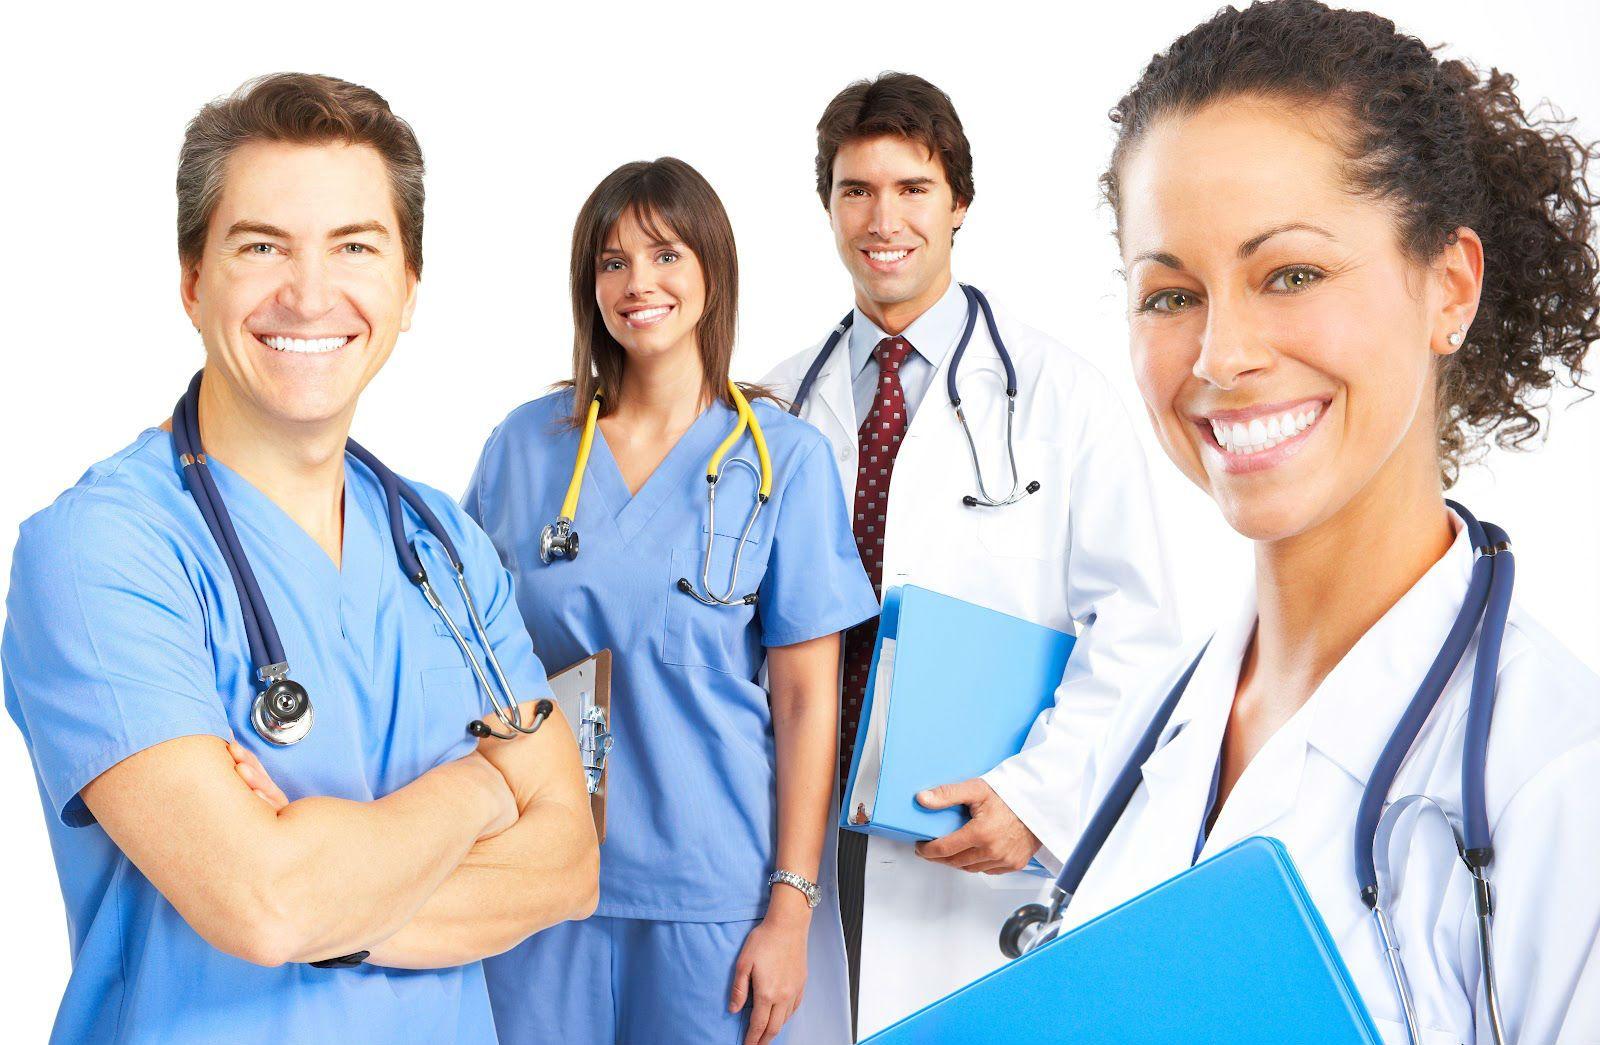 Phd In Nursing Phd In Nursing In India Phd Admission 2014 Phd